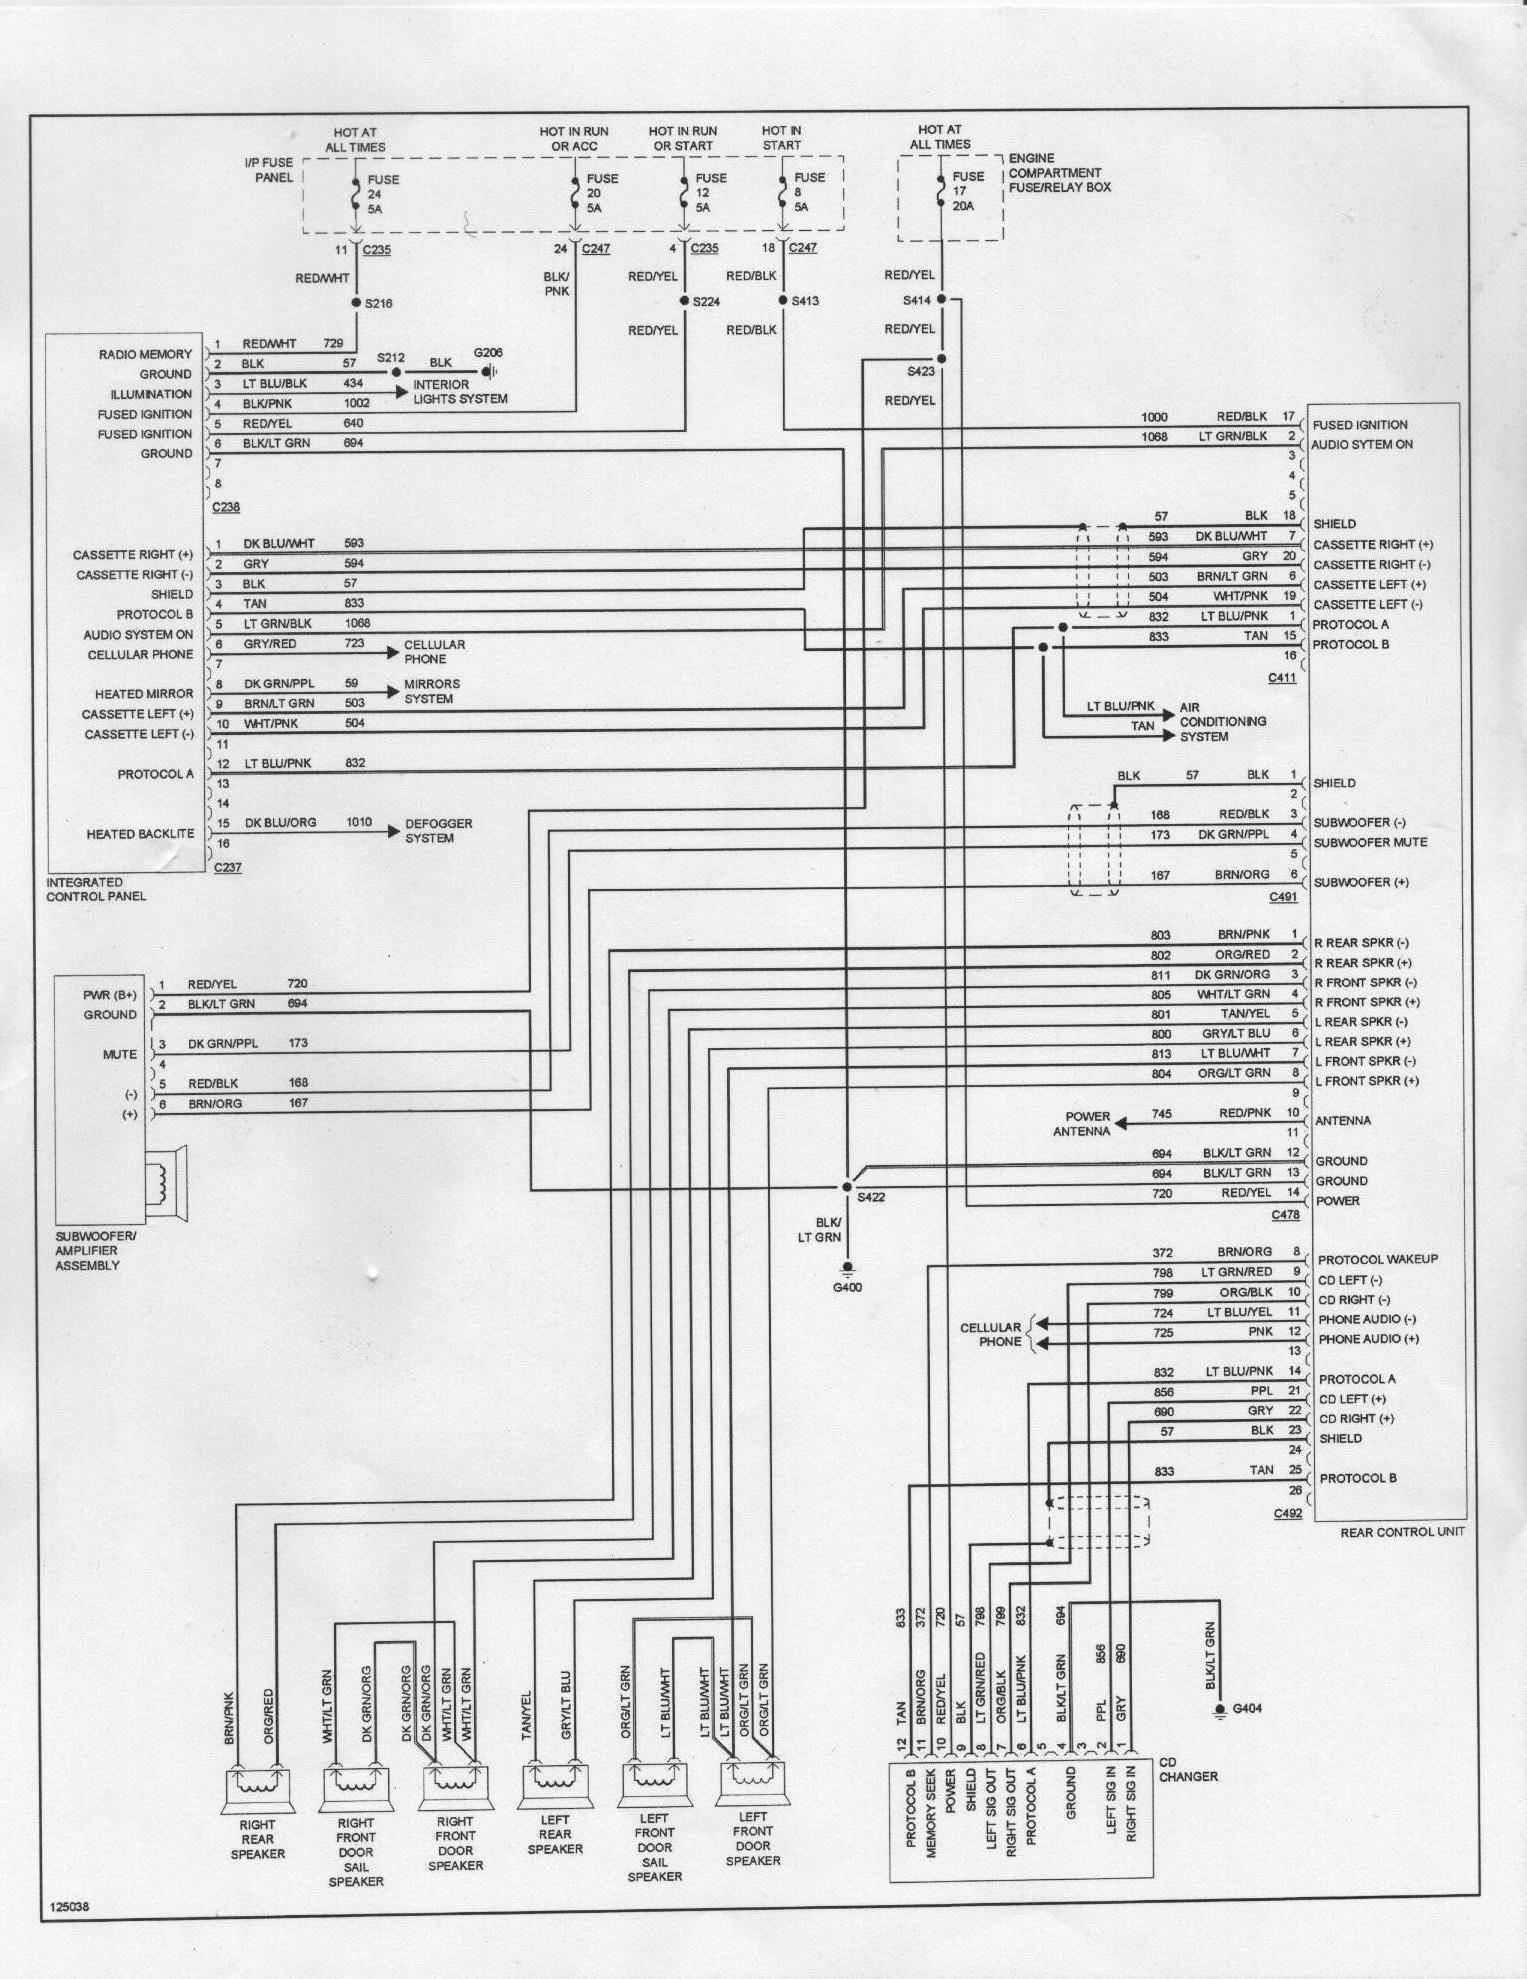 2002 ford Taurus Wiring Diagram 2002 ford Taurus Wiring Diagram New 1995 In Of 2002 ford Taurus Wiring Diagram